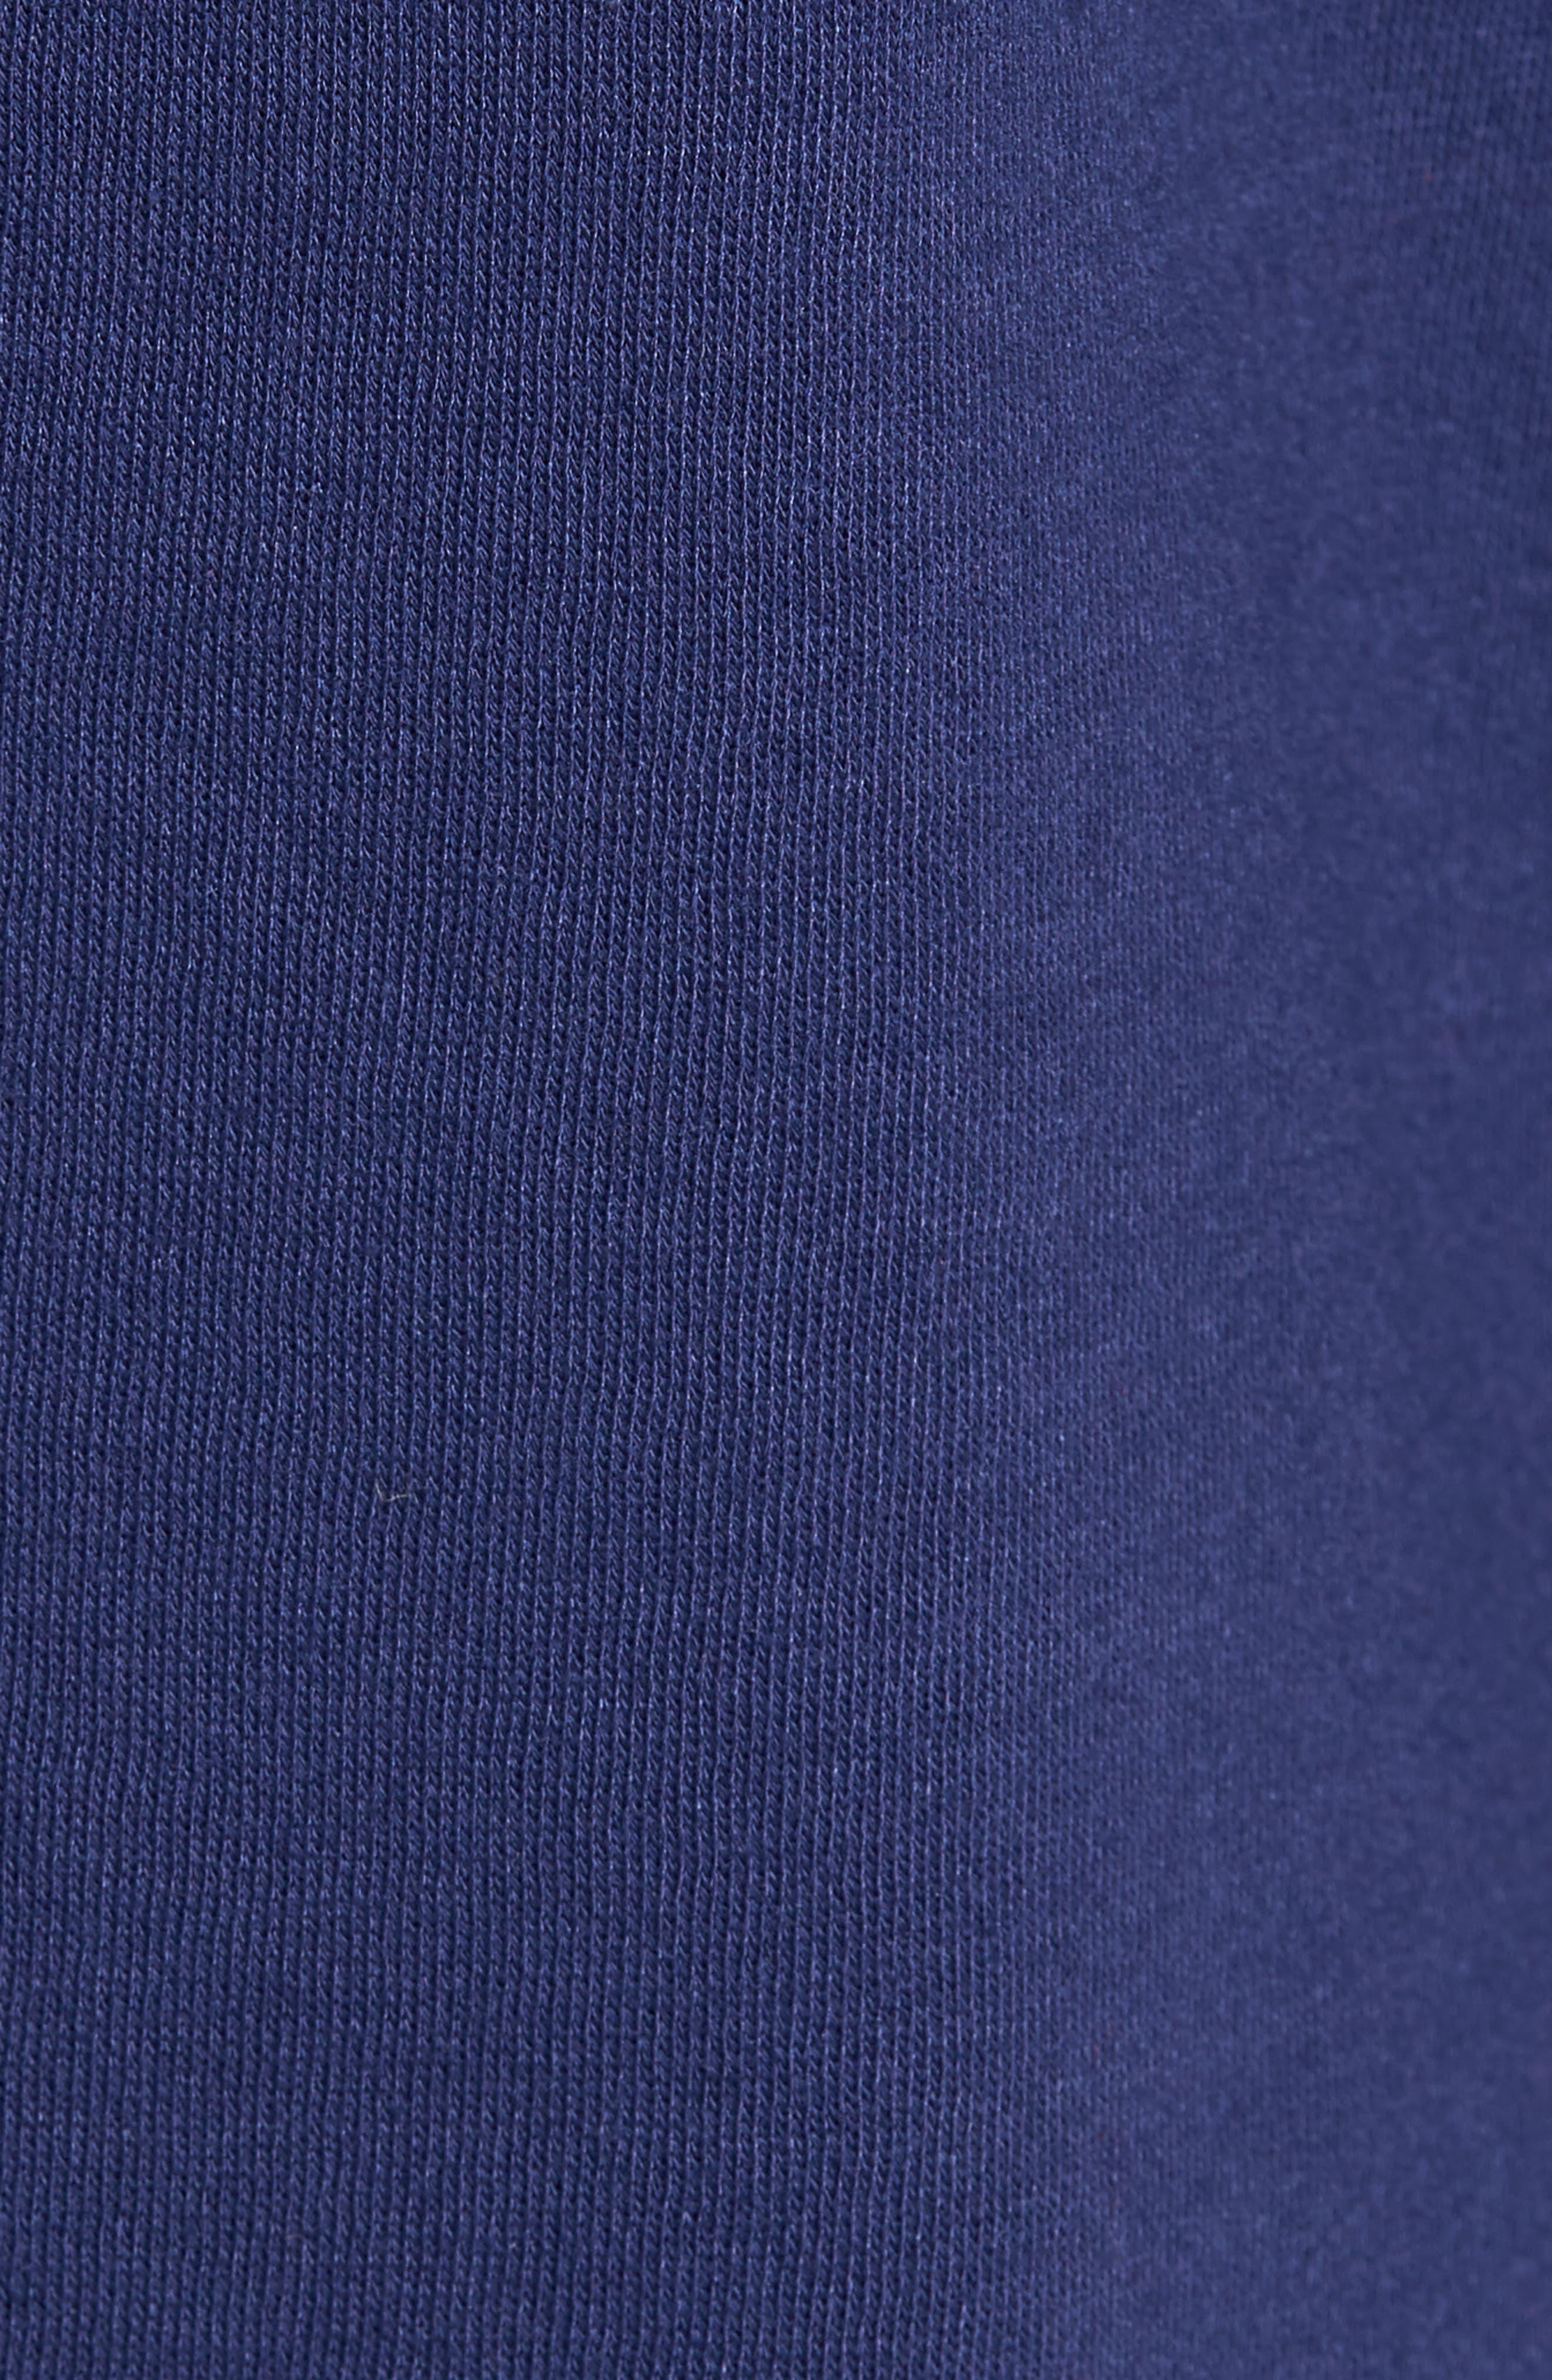 Fleece One-Piece Pajamas,                             Alternate thumbnail 5, color,                             040